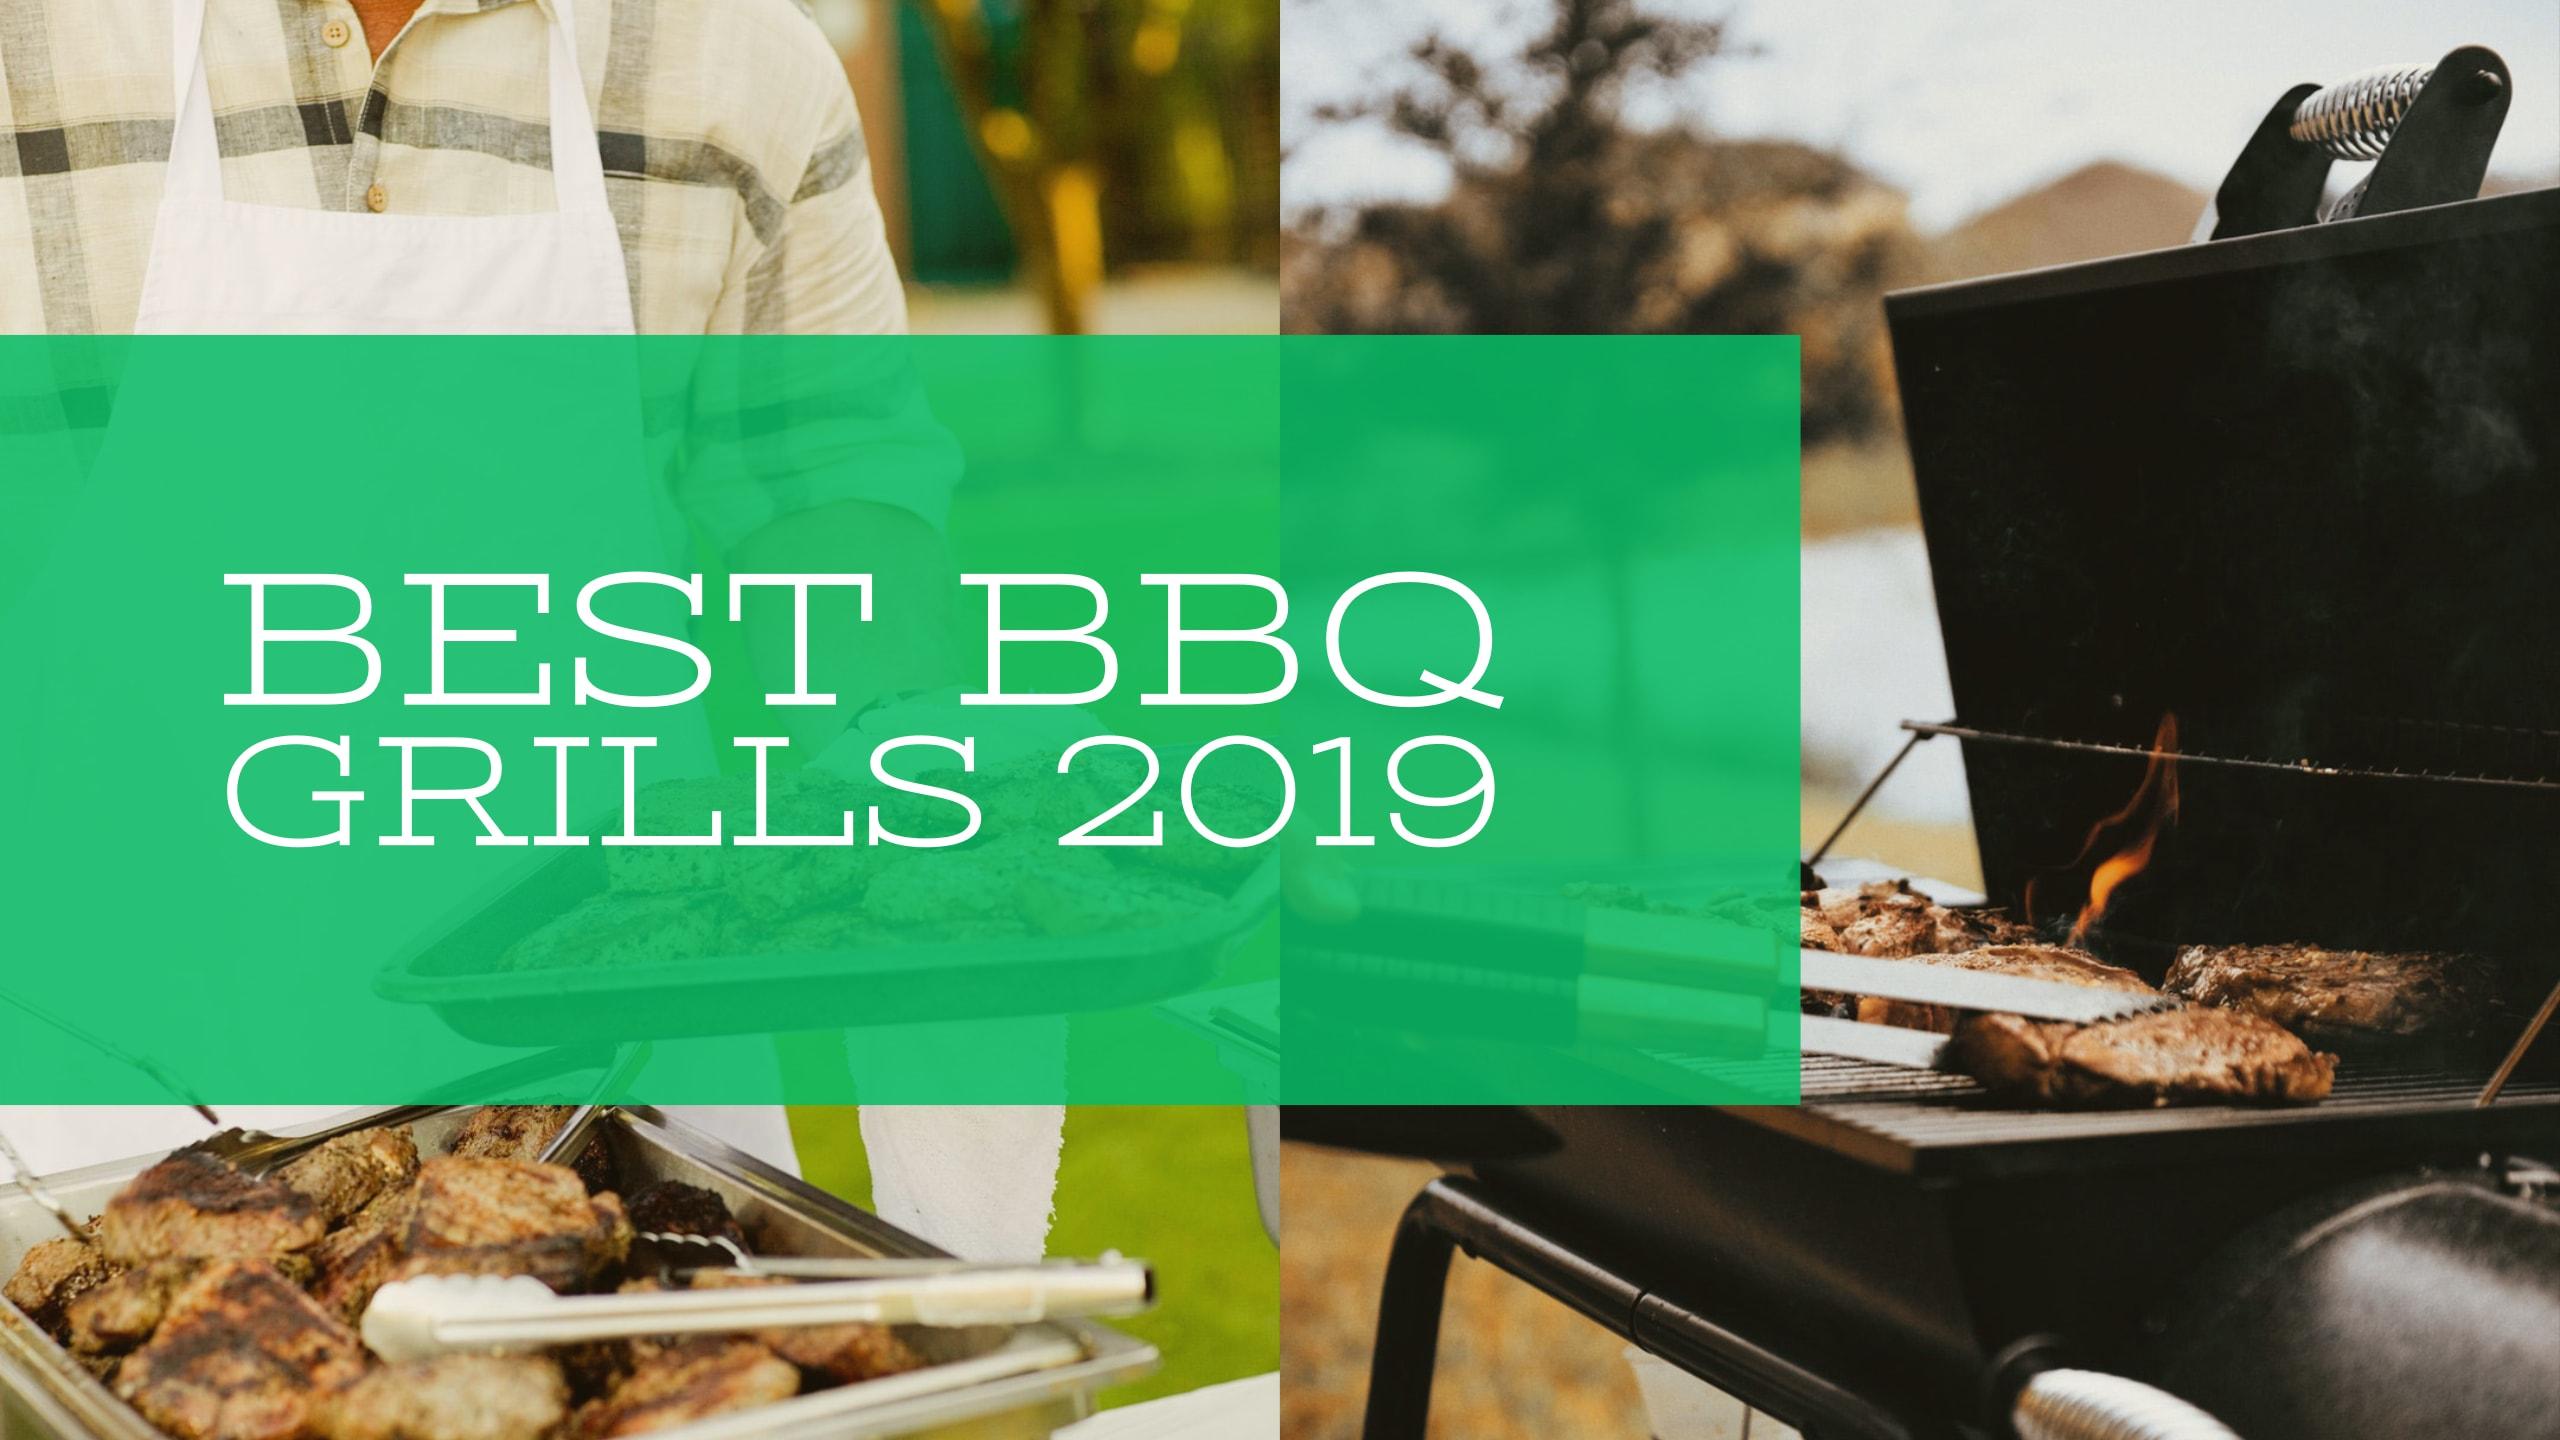 Best BBQ Grills 2019